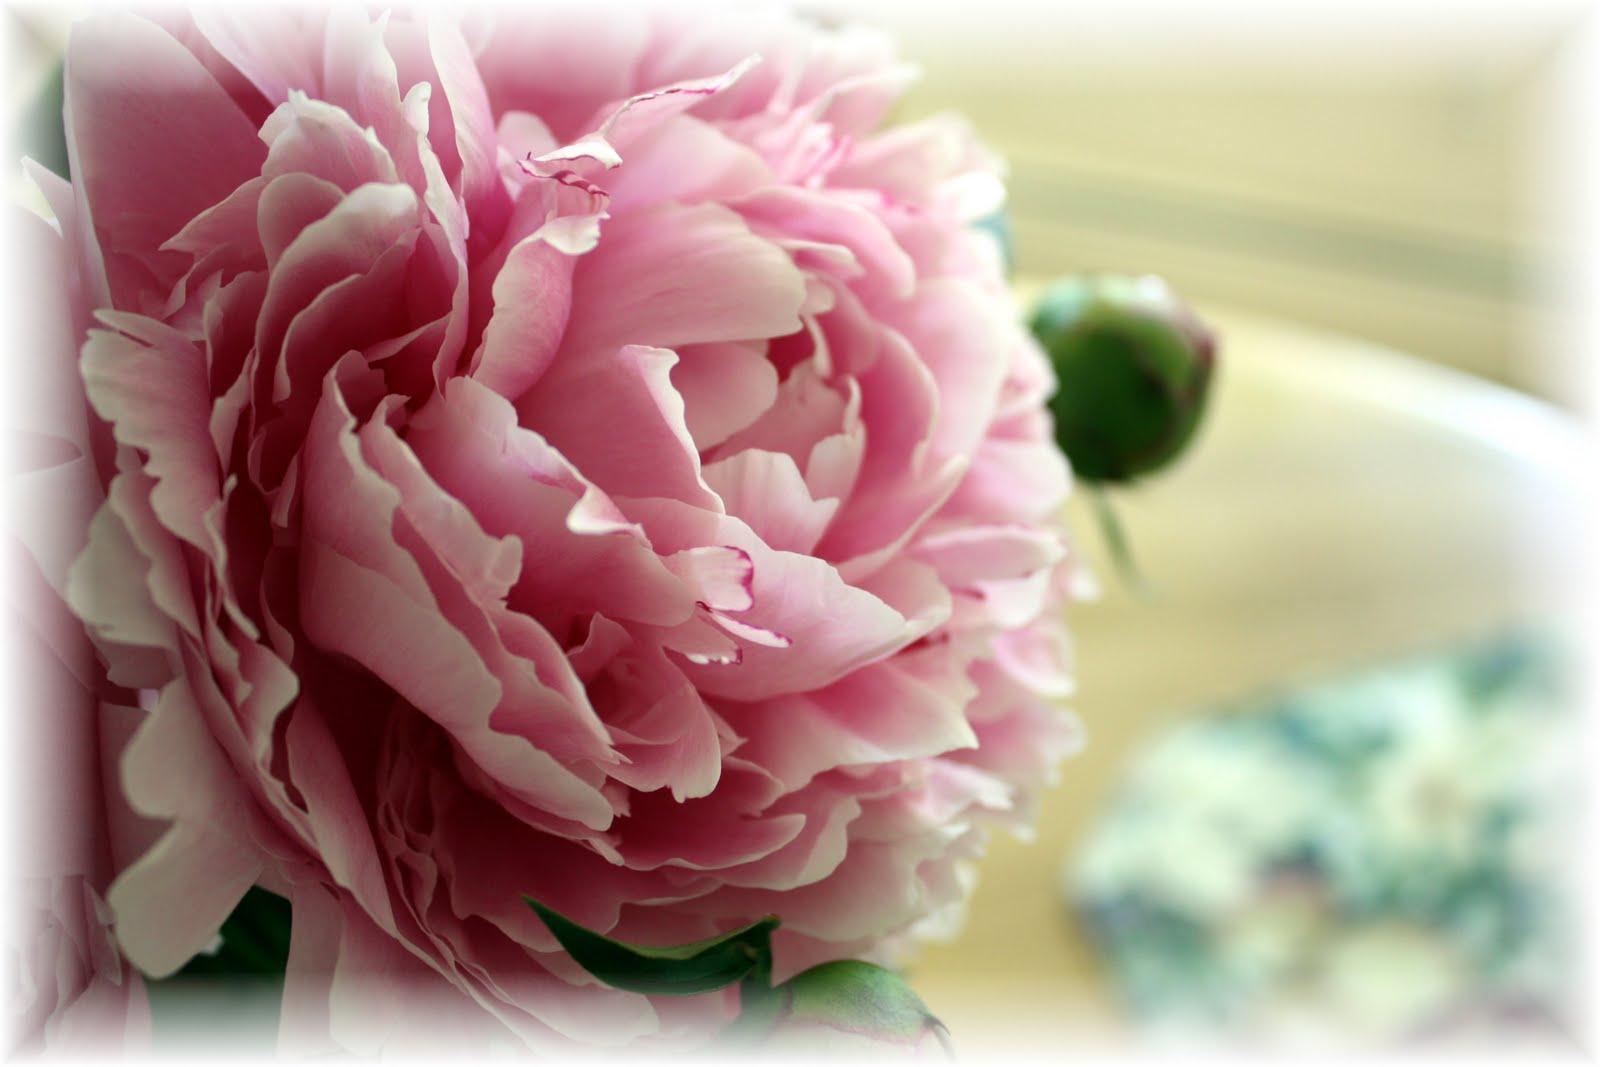 Tissue Paper Flowers In My Garden Journal A Little Something